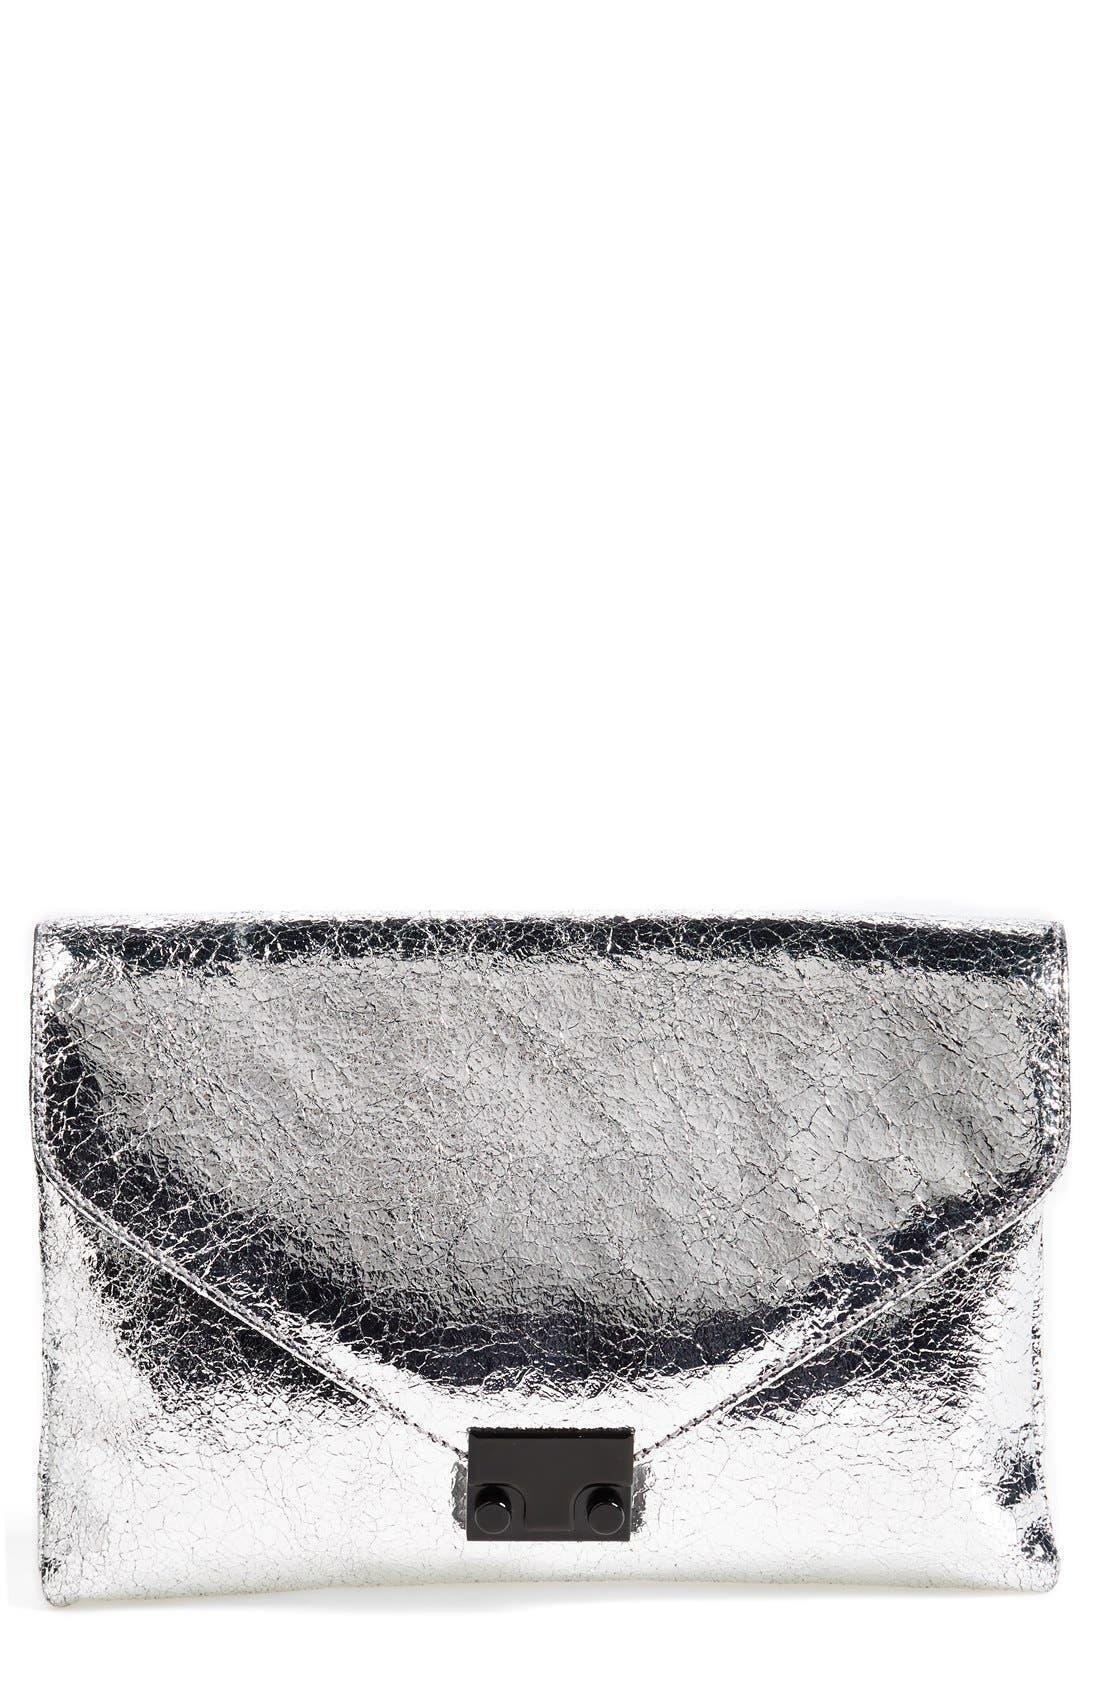 'Lock' Metallic Leather Clutch,                             Main thumbnail 1, color,                             040